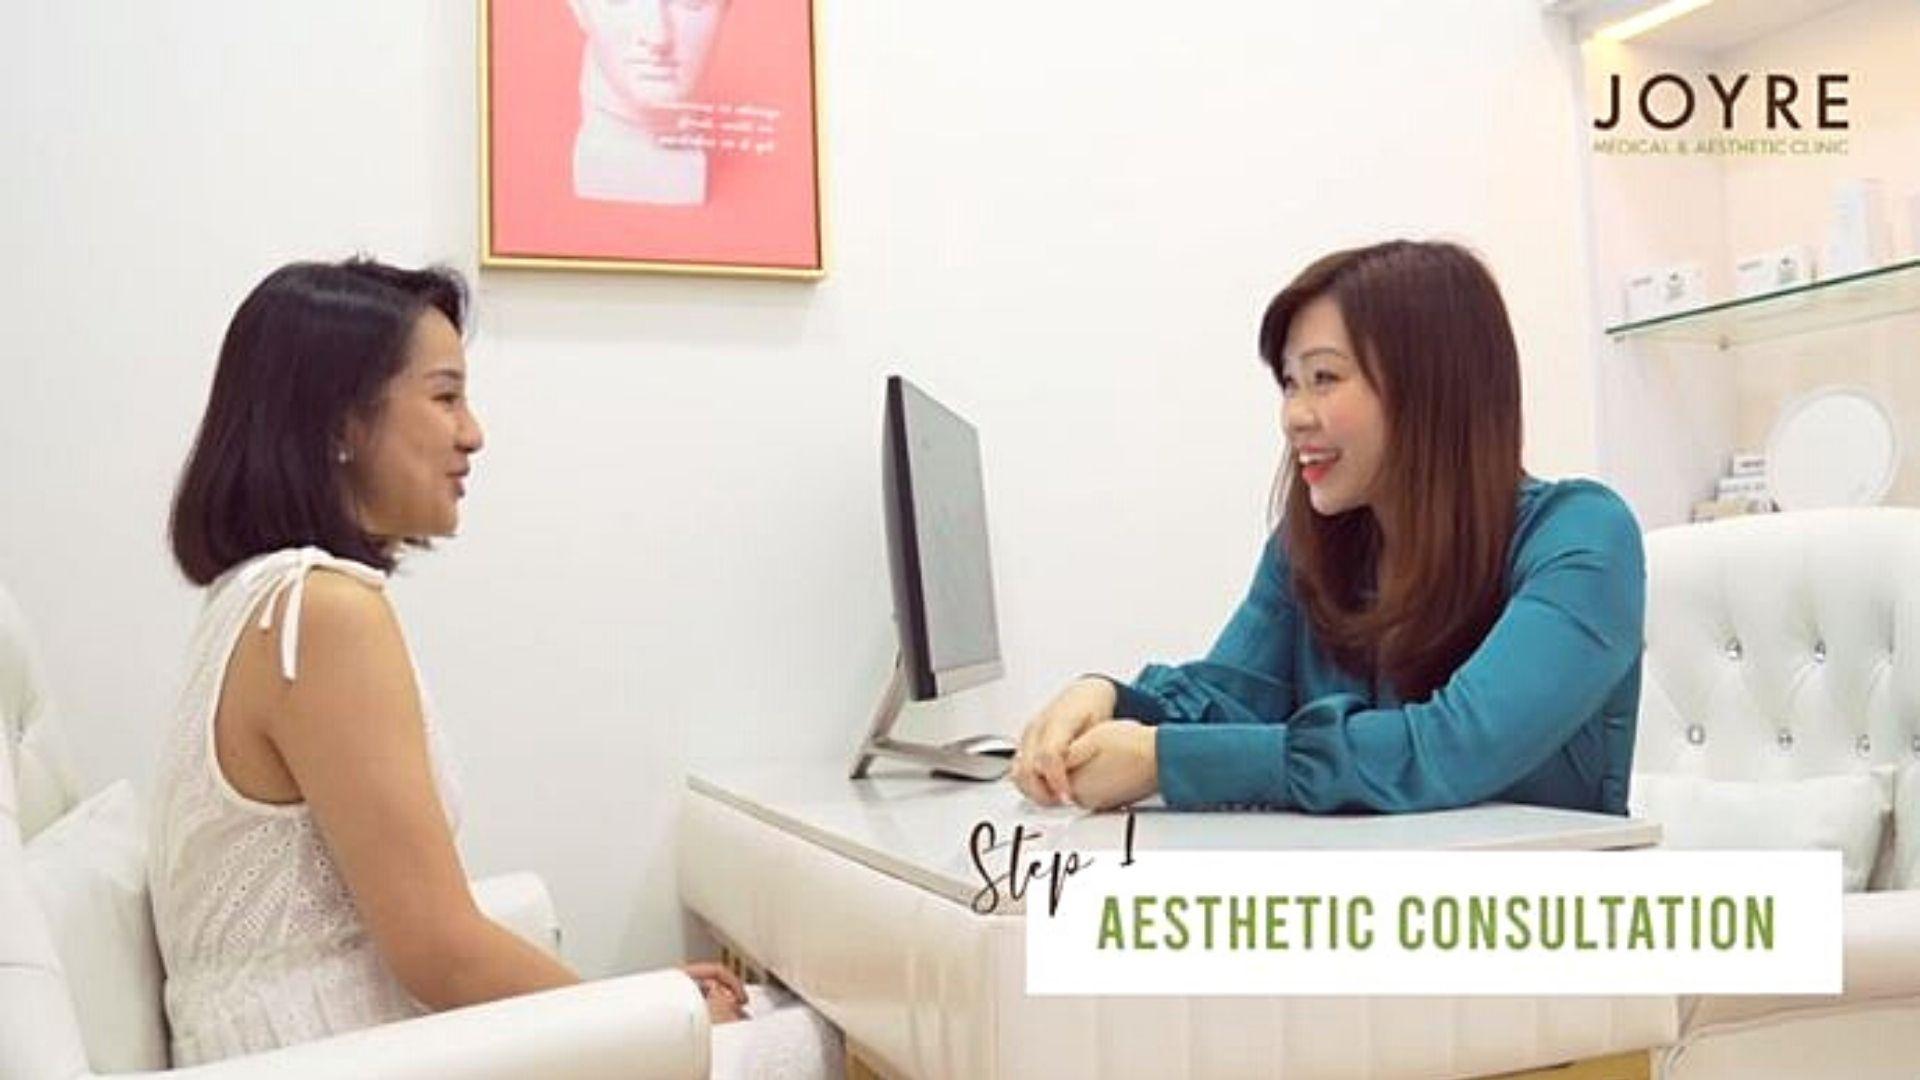 joyre medical aesthetic consultation